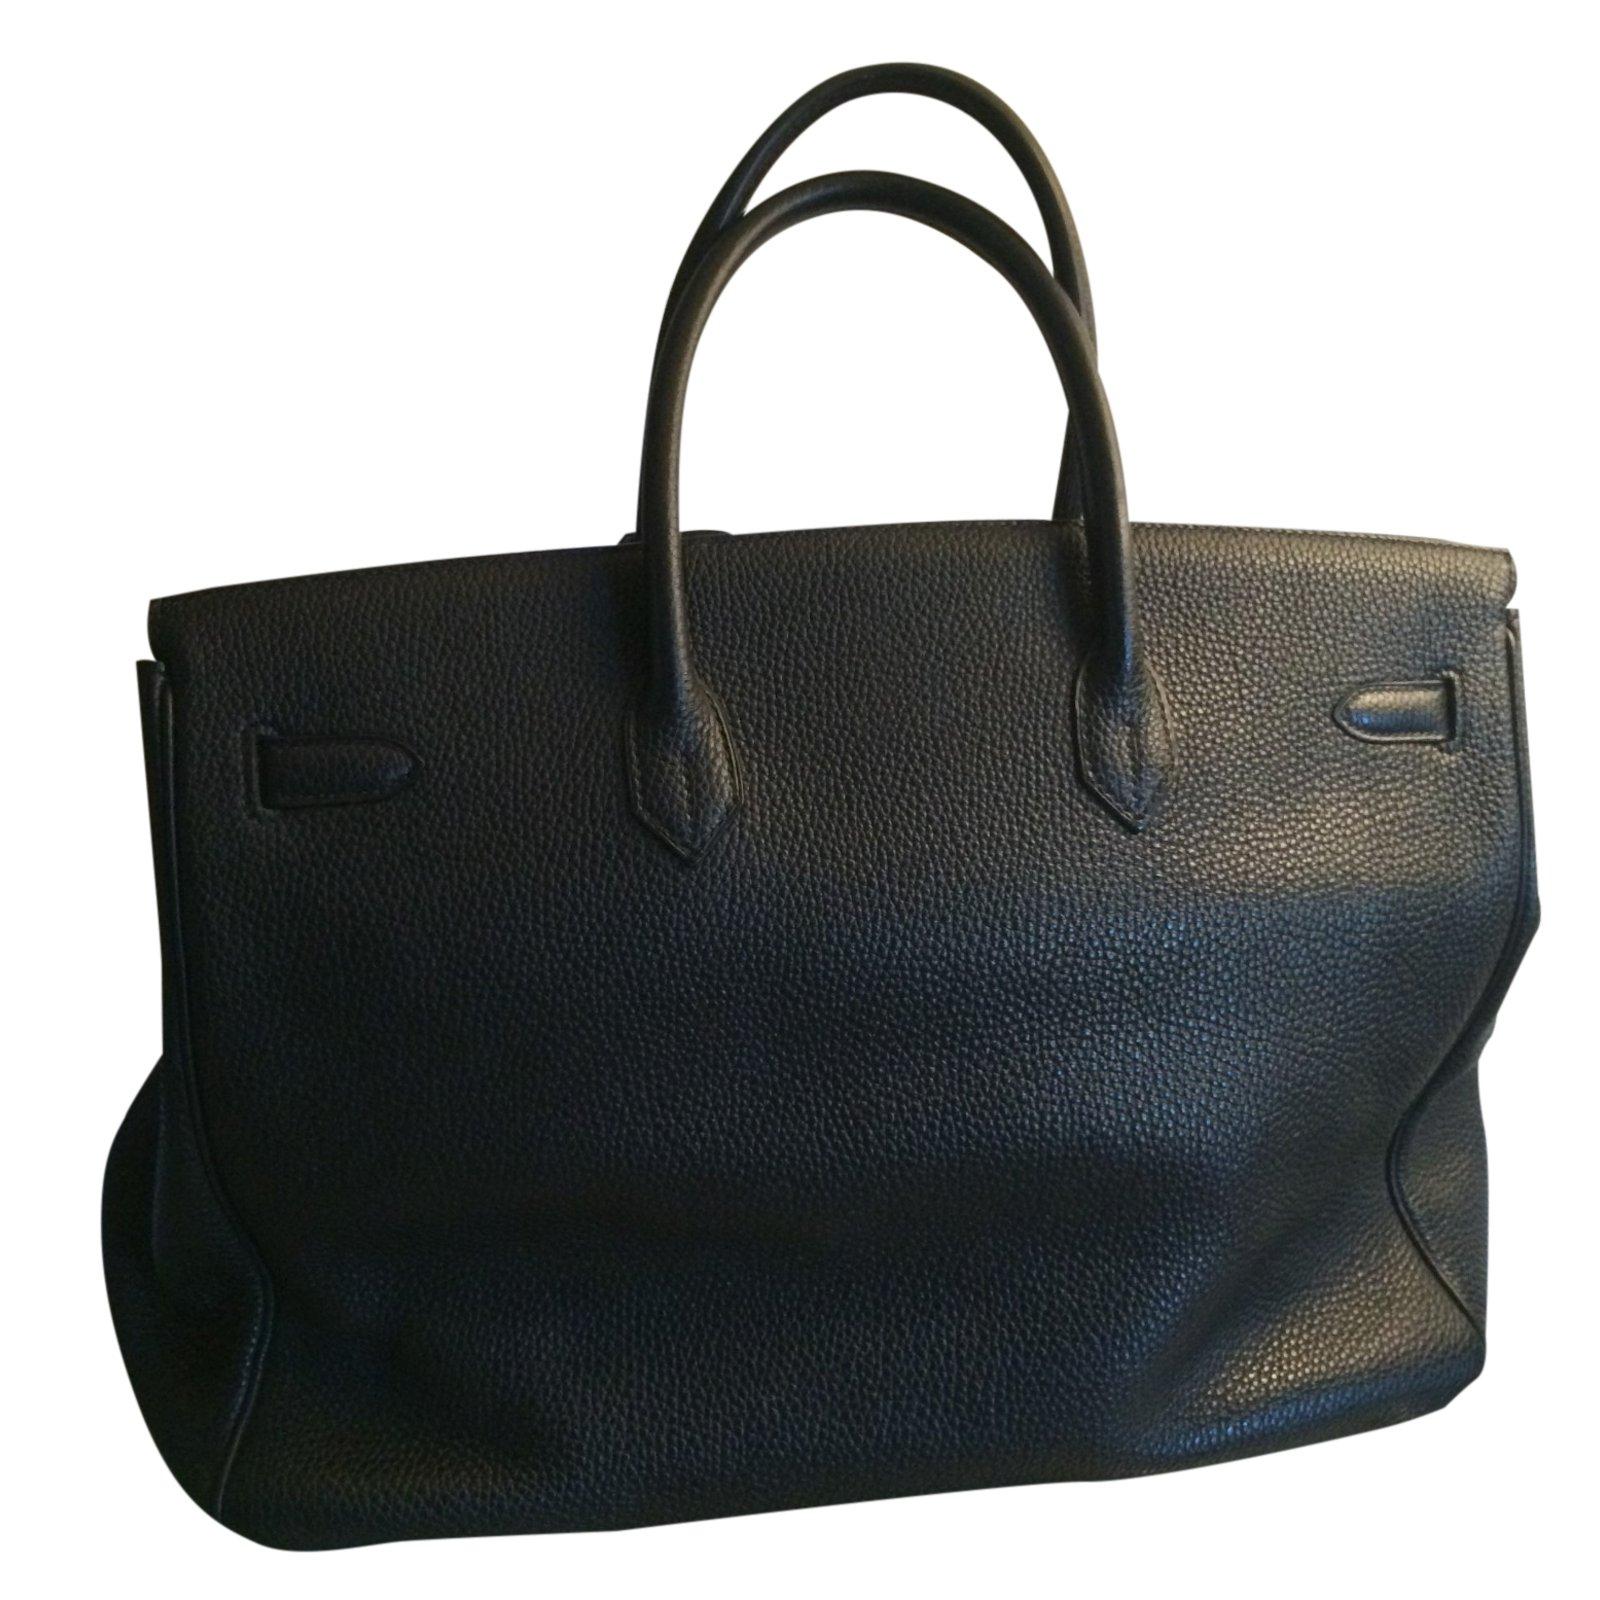 f01674bd0a Sacs à main Hermès BIRKIN 40 noir palladium Cuir Noir ref.25414 - Joli  Closet